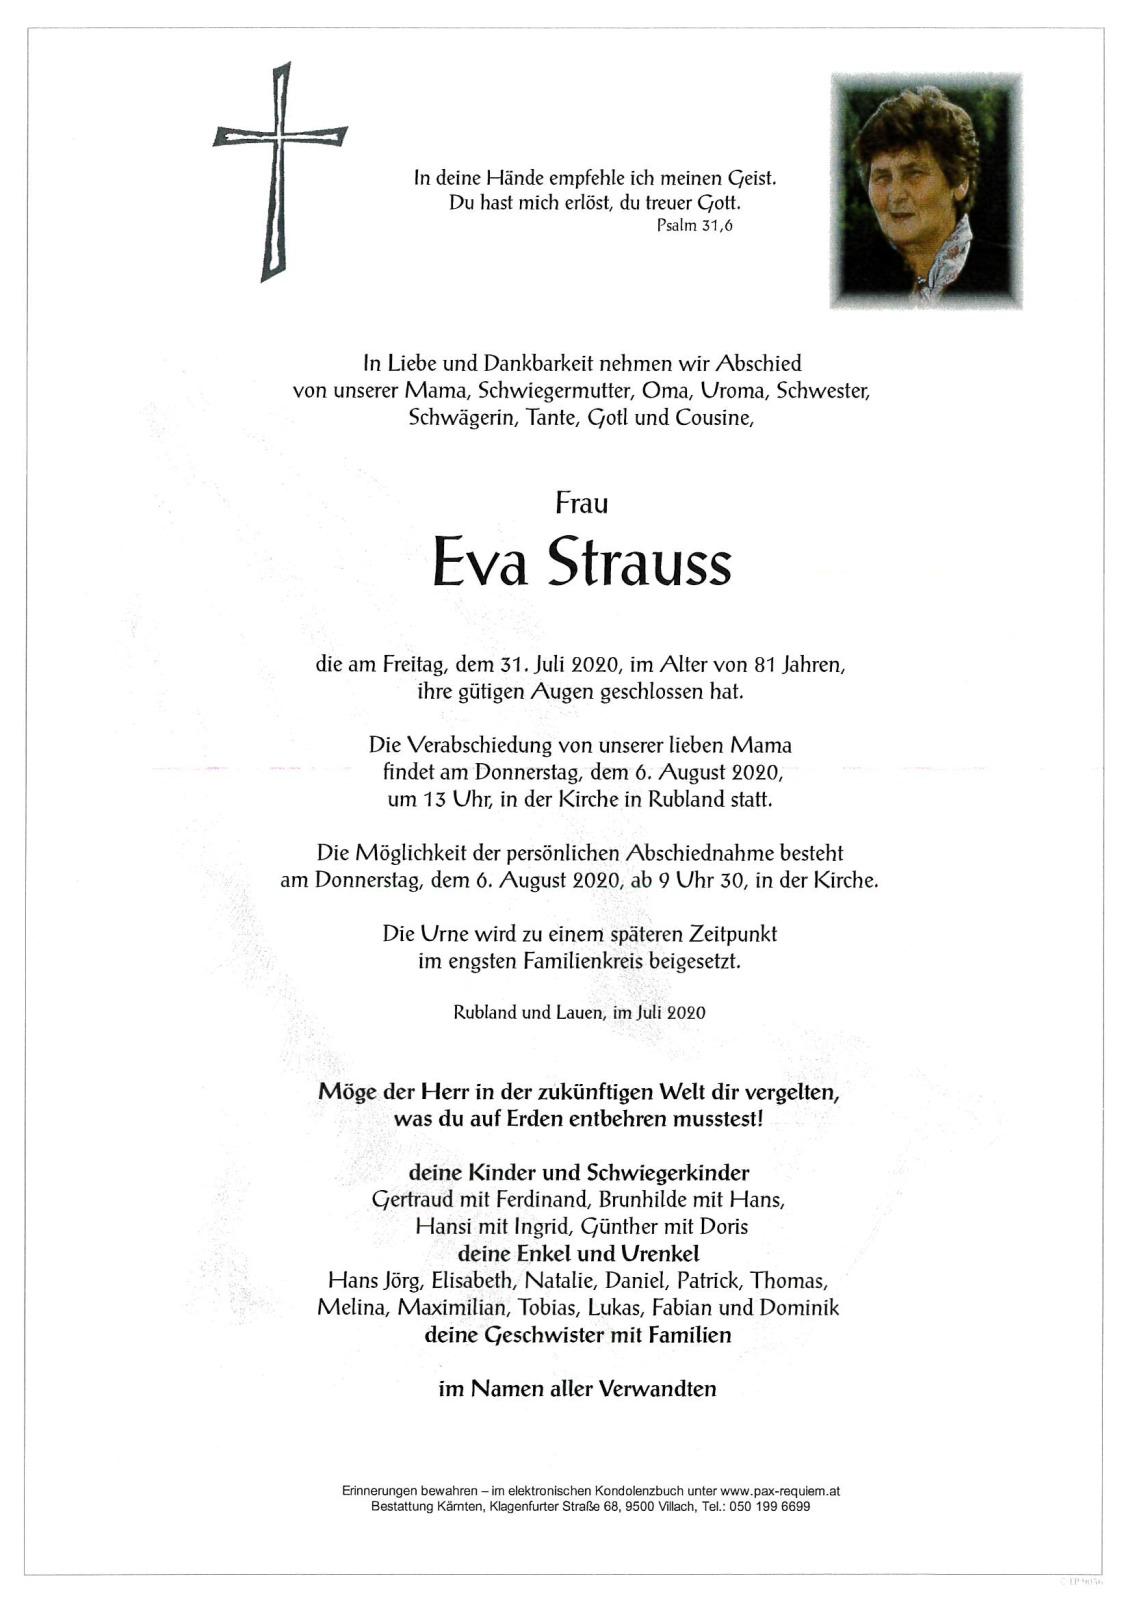 Strauss eva Eva Strauss